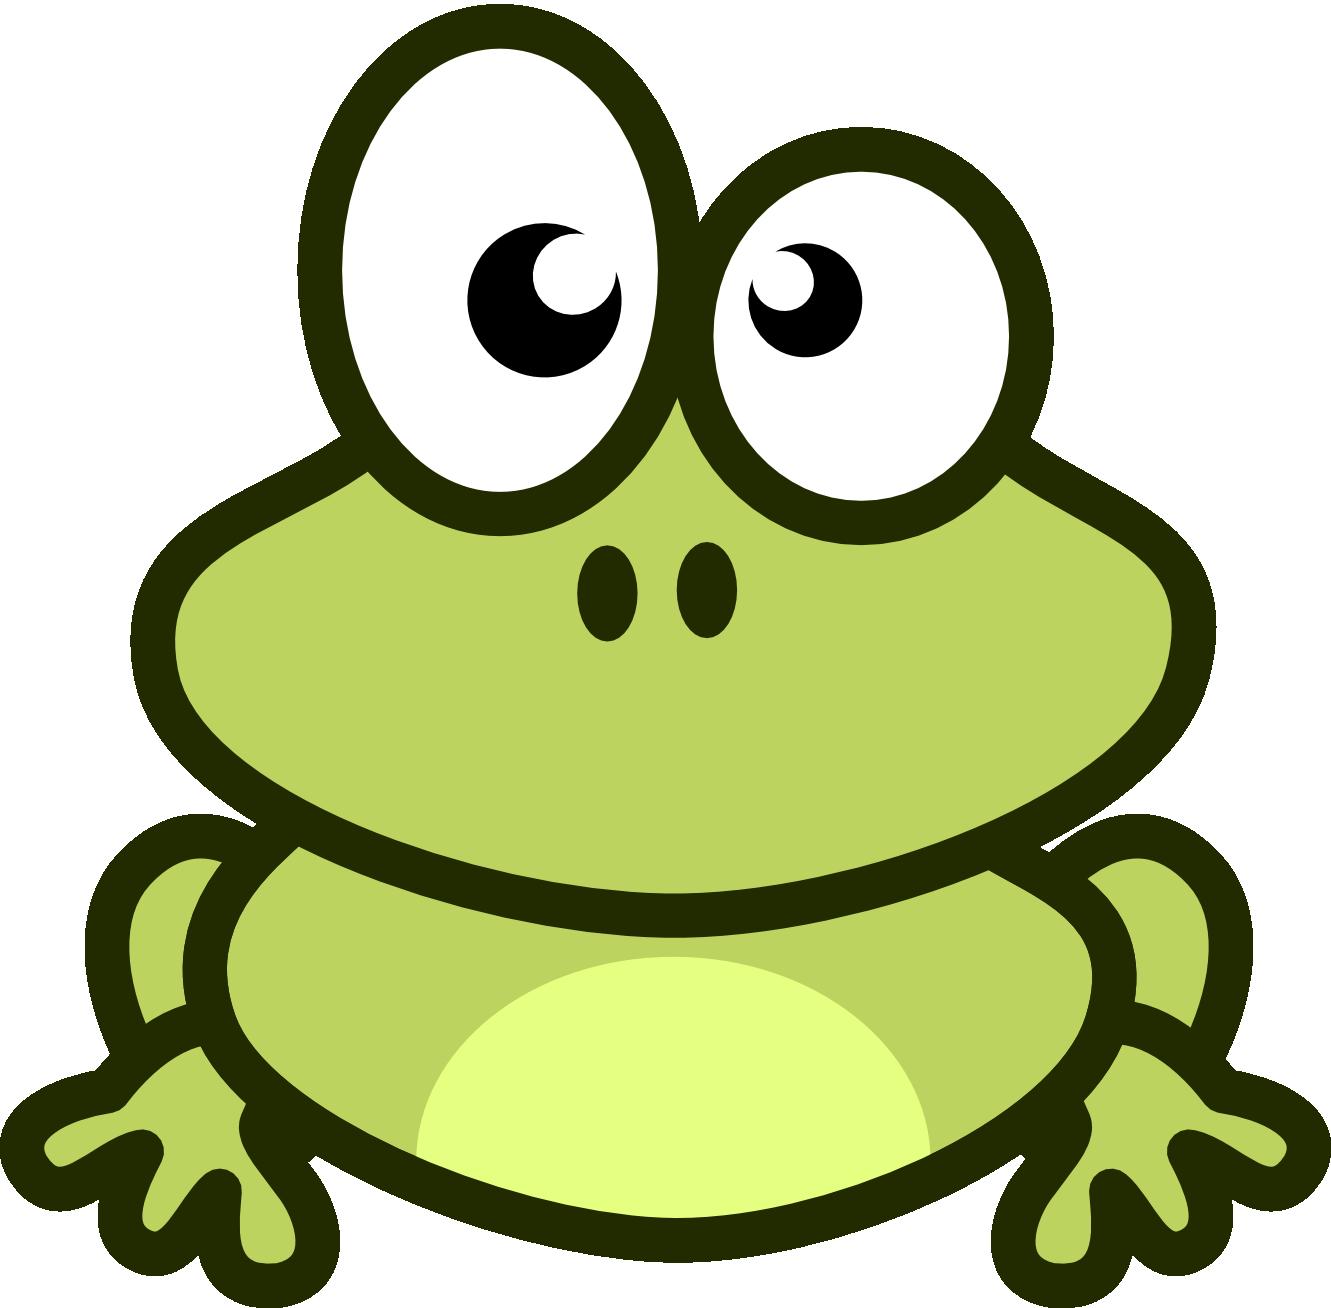 School frog clipart stock Frog Clip Art School | Clipart Panda - Free Clipart Images stock